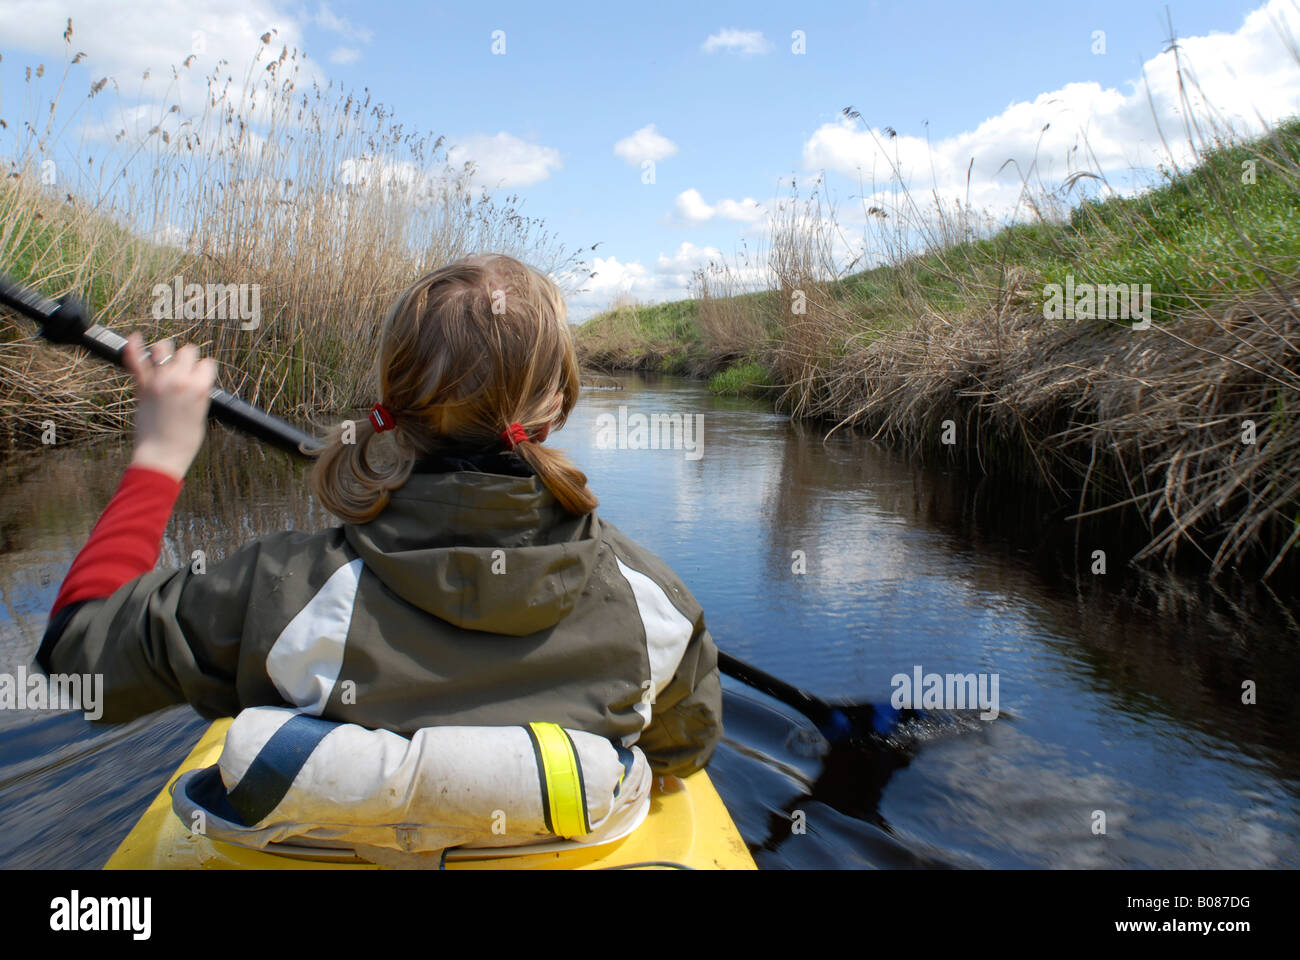 kayak paddler in river, Sweden - Stock Image